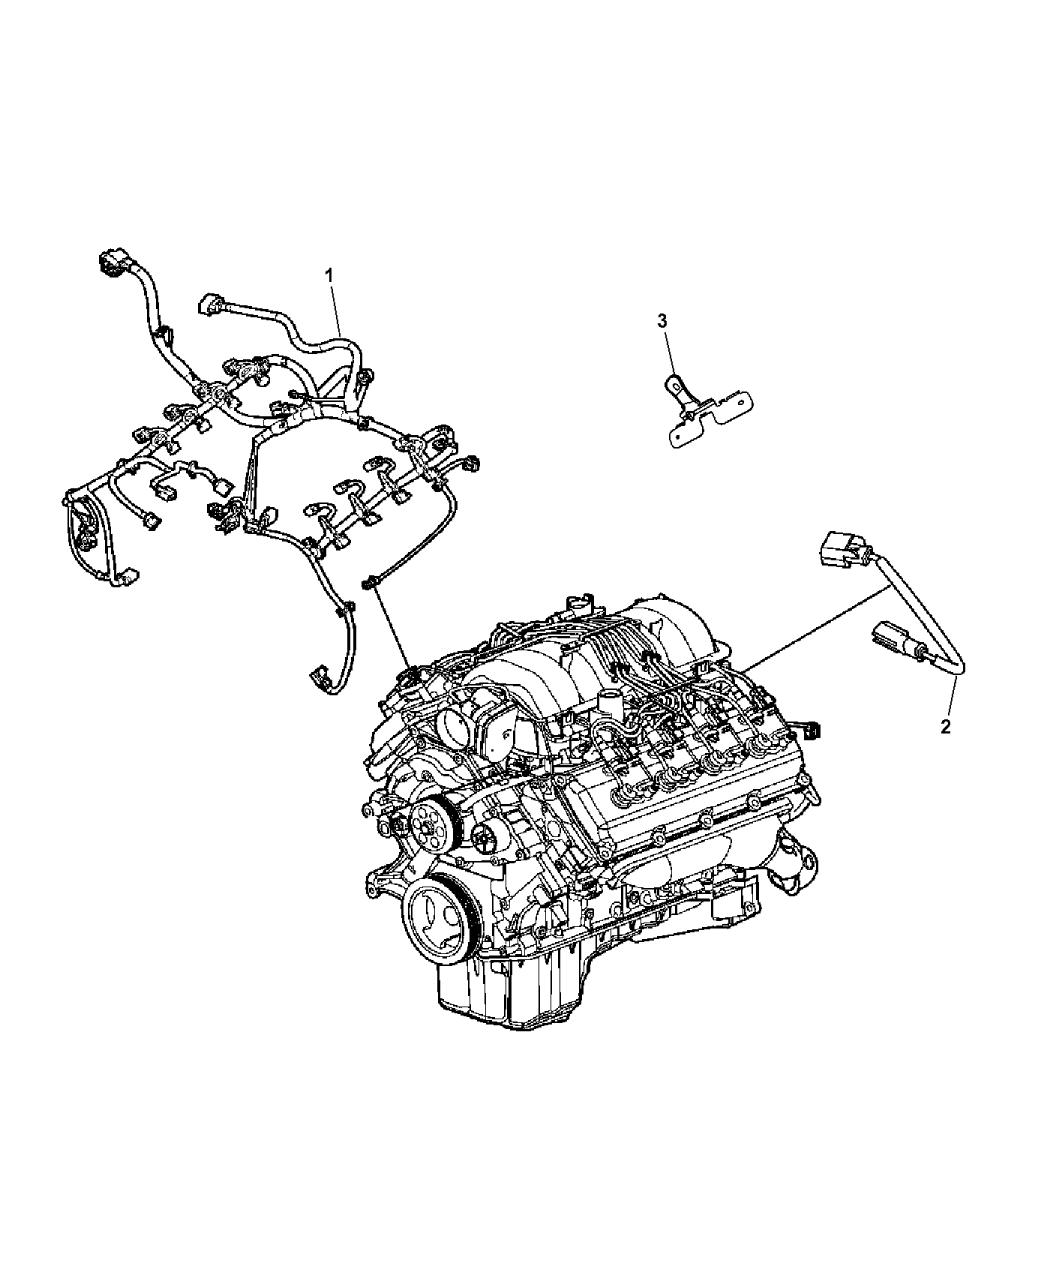 68160885AA - Genuine Ram WIRING-ENGINE AND TRANSMISSION